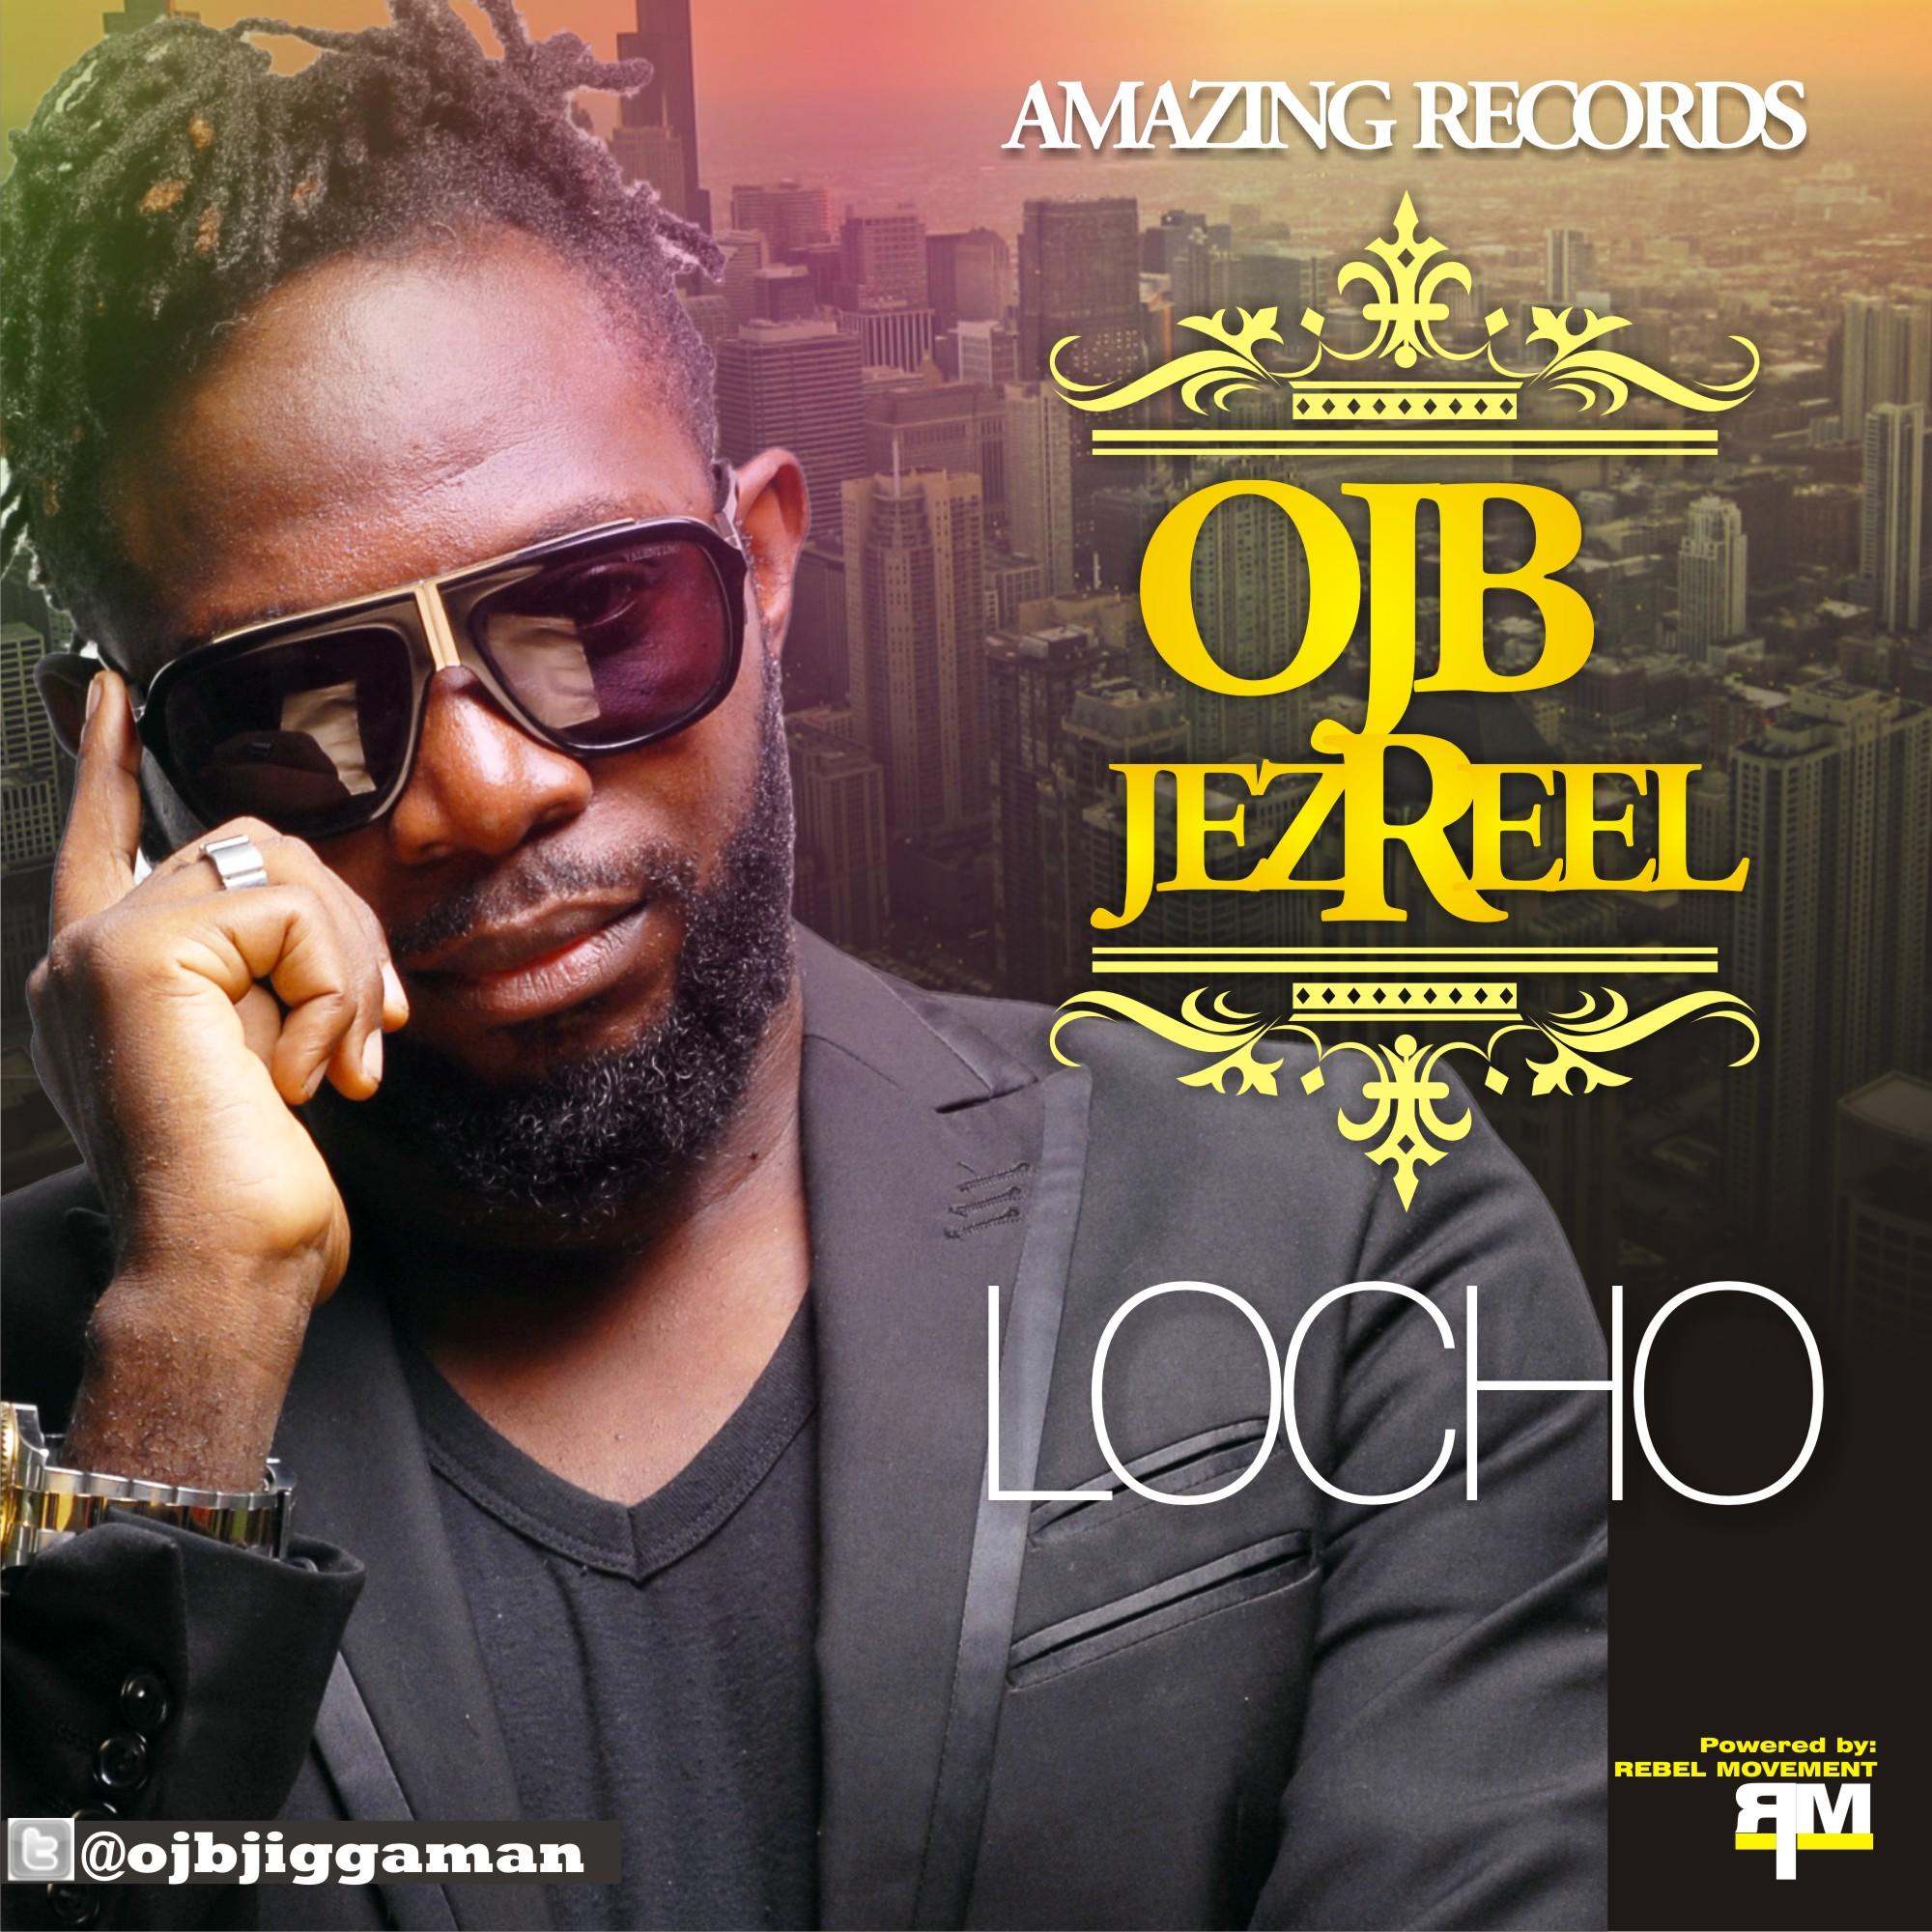 OJB Jezreel - Locho - Latest Naija Nigerian Music, Songs ...